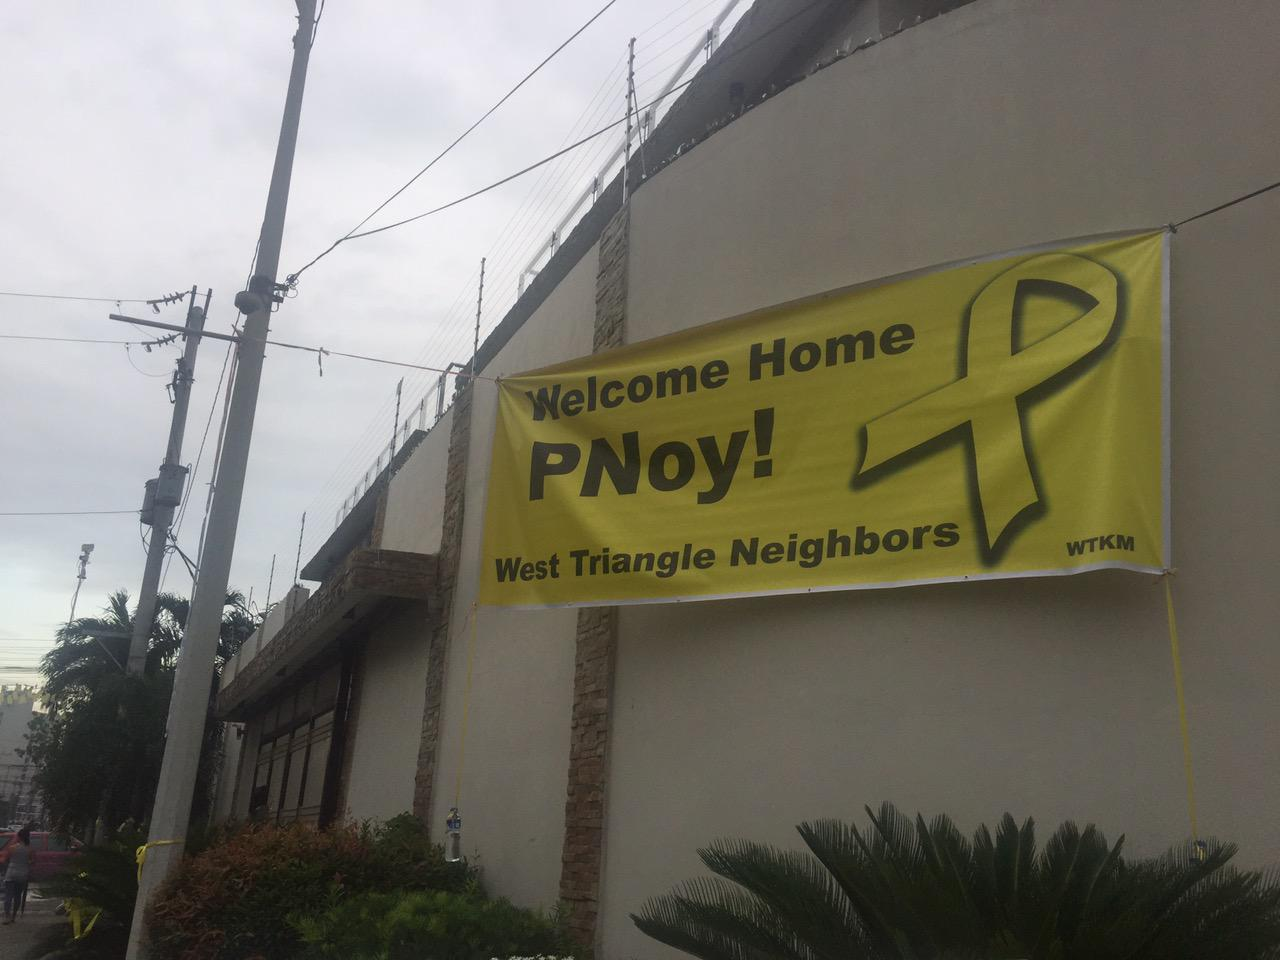 IN PHOTOS: QC neighbors welcome Aquino back